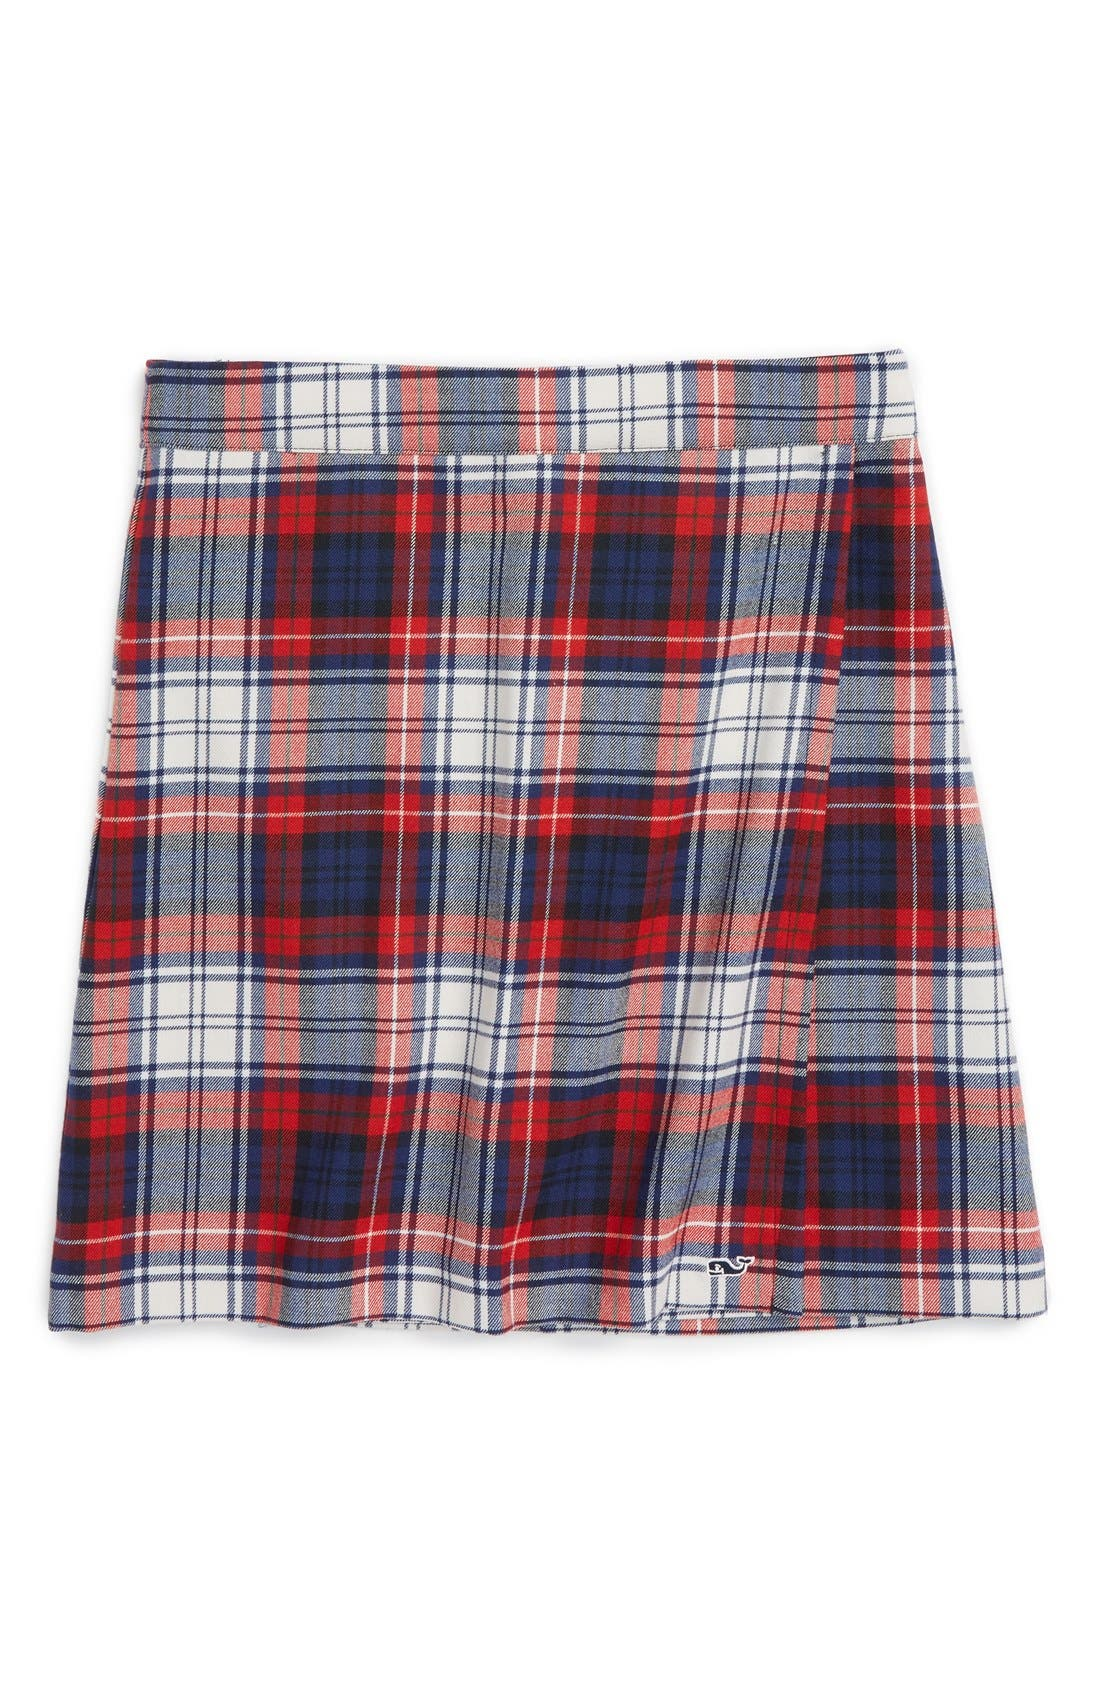 Wool Plaid Skirt,                             Main thumbnail 1, color,                             476